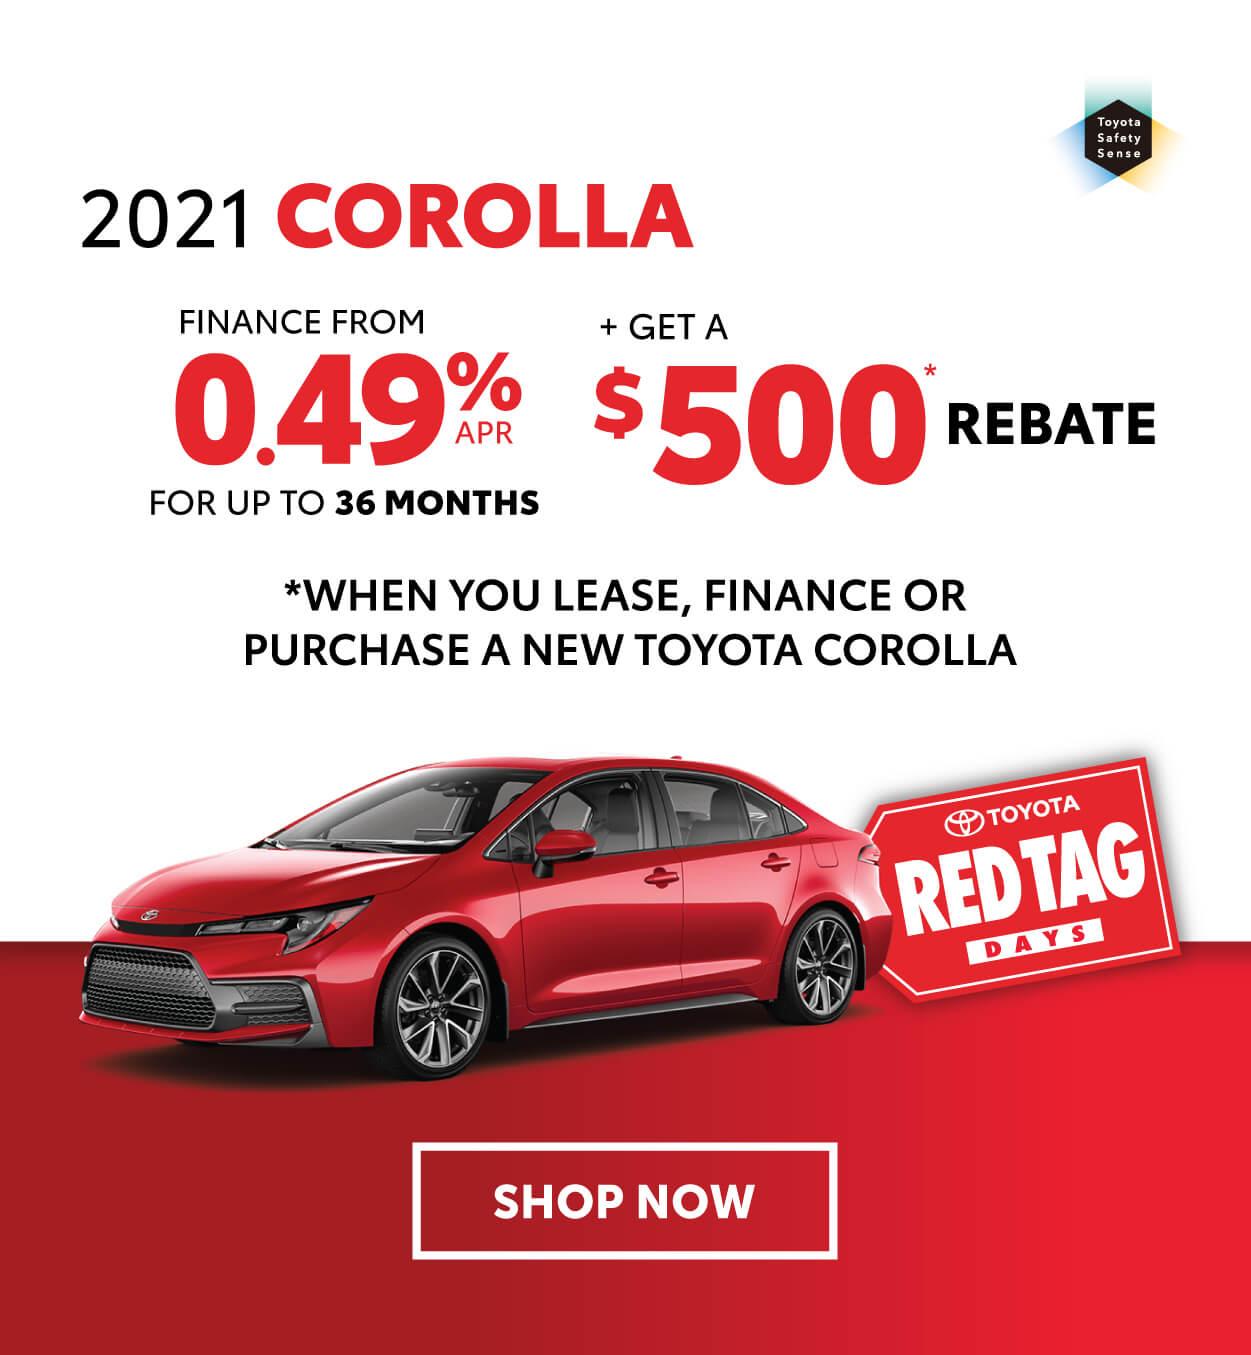 Georgetown Toyota Corolla Offer